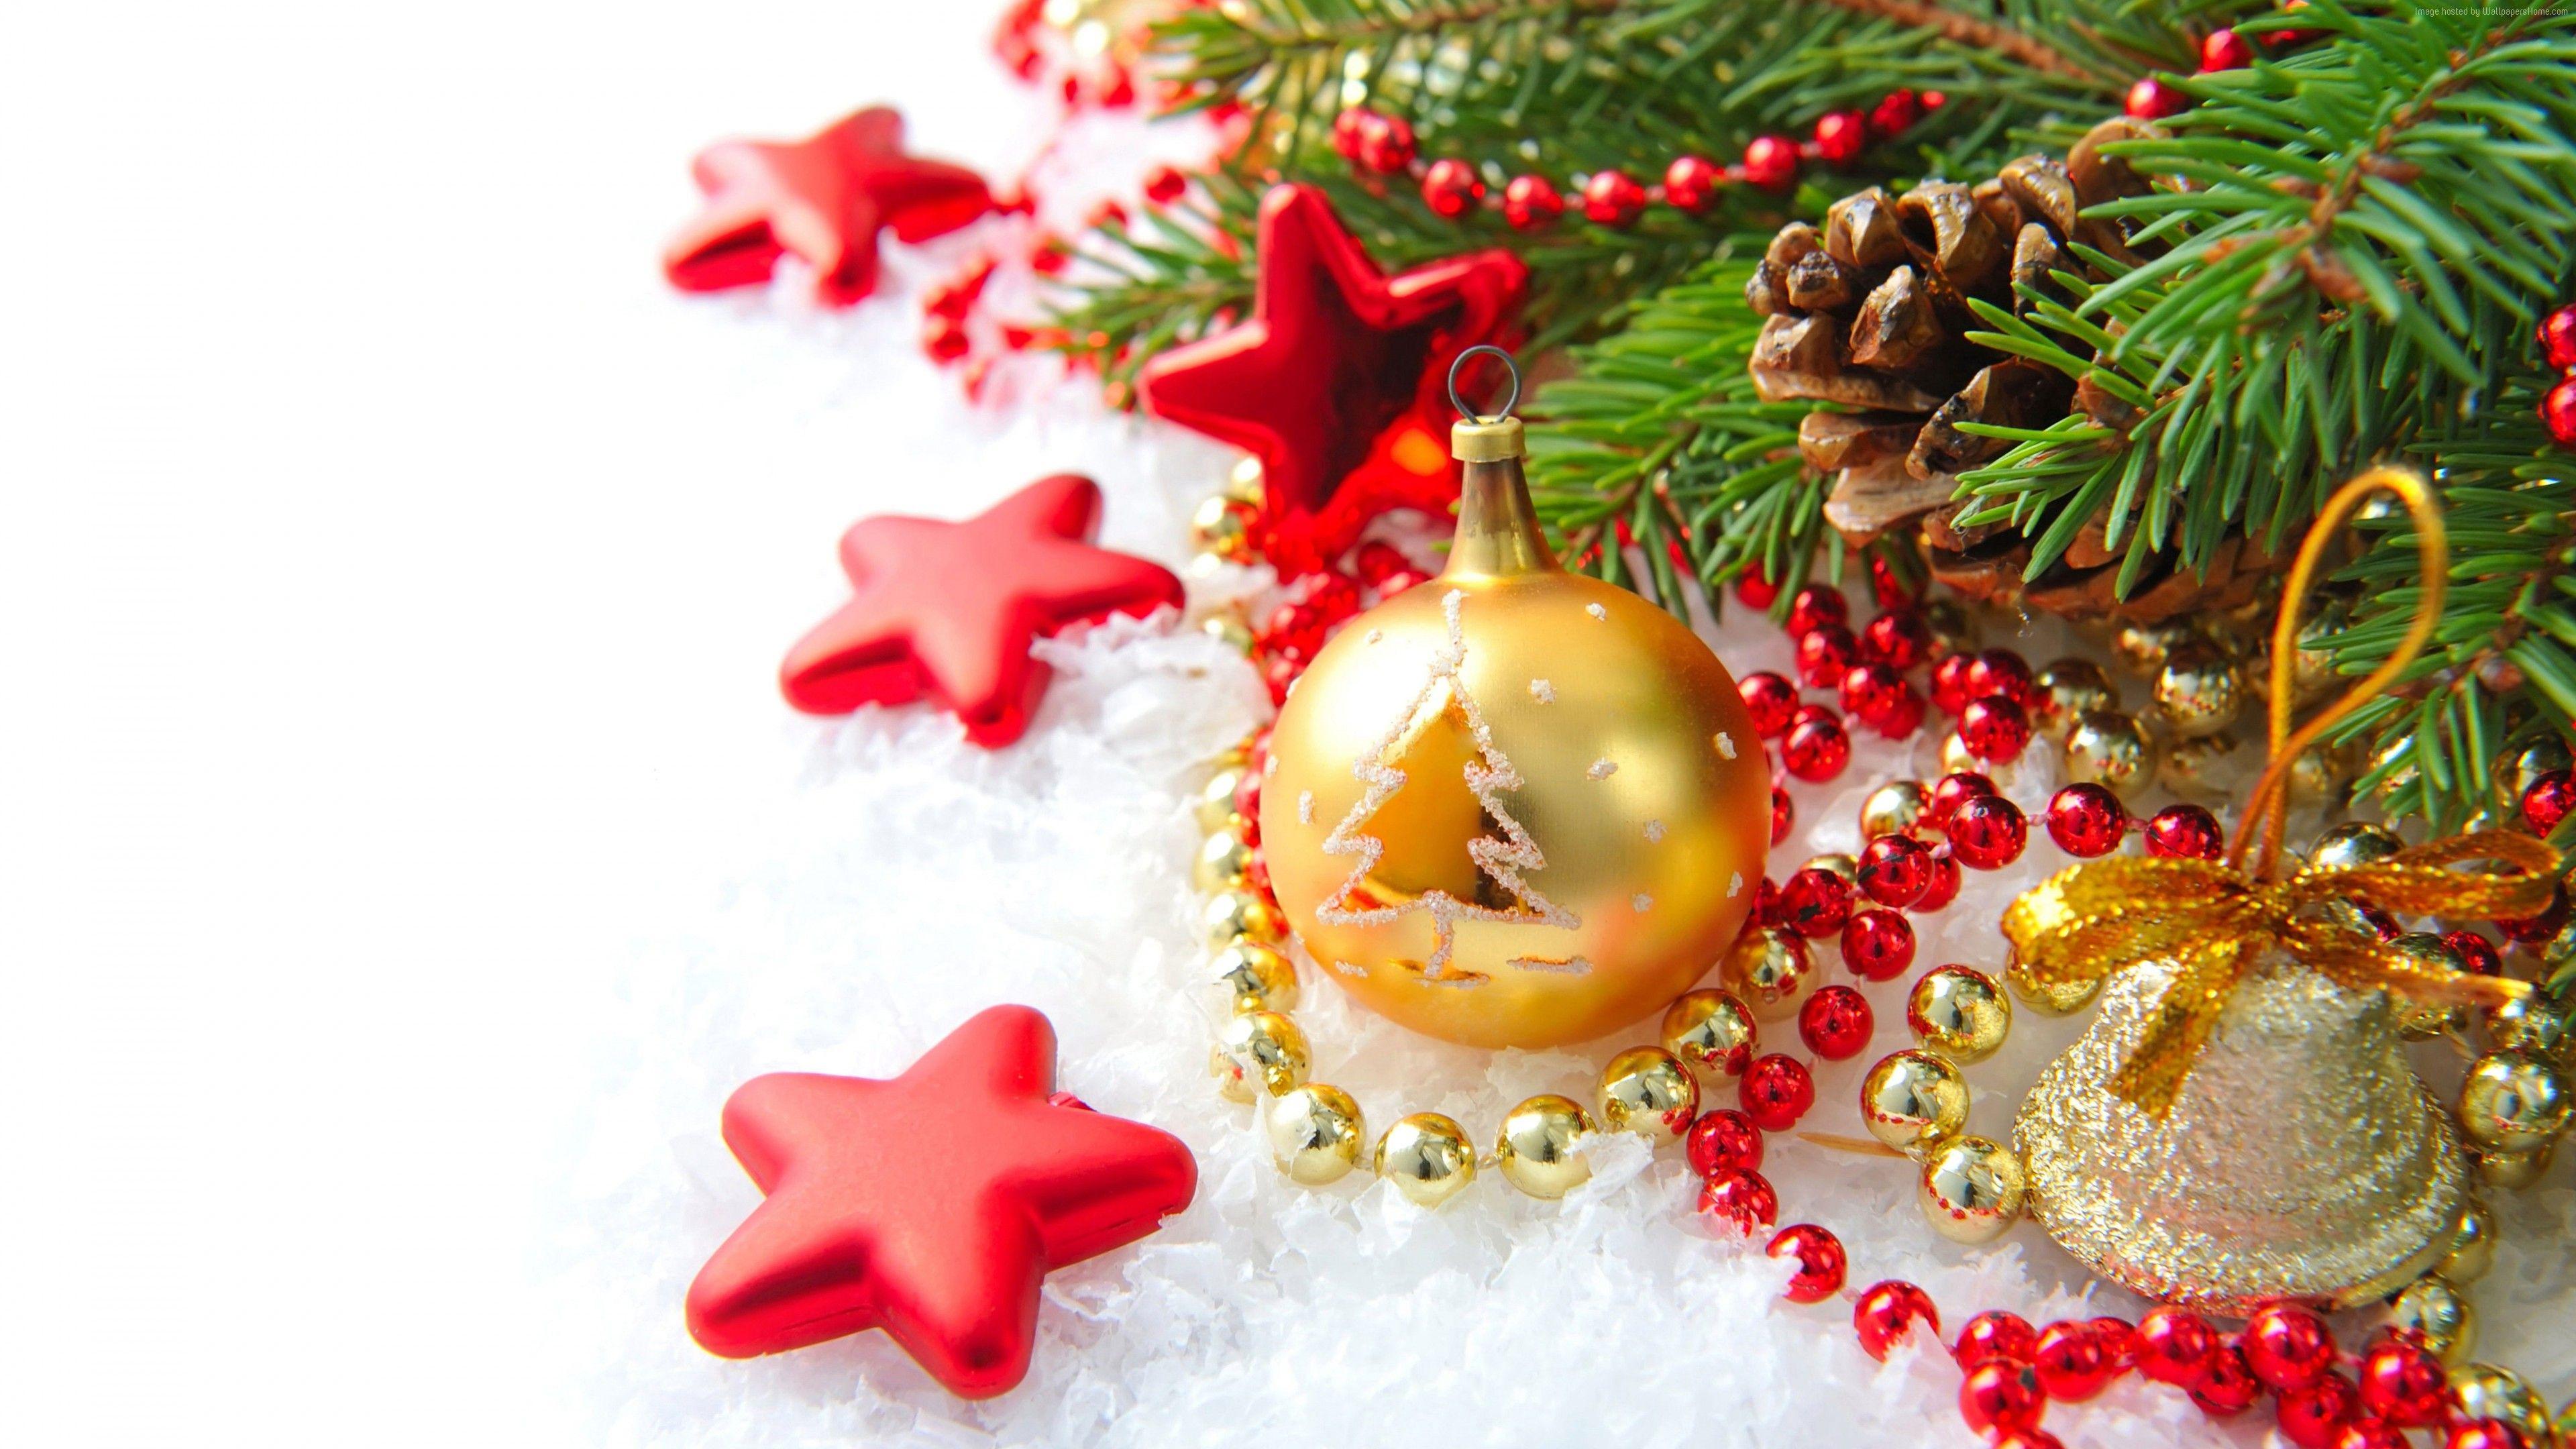 Wallpaper Christmas, New Year, Decoration, Fir Tree, 8K, Holidays Http